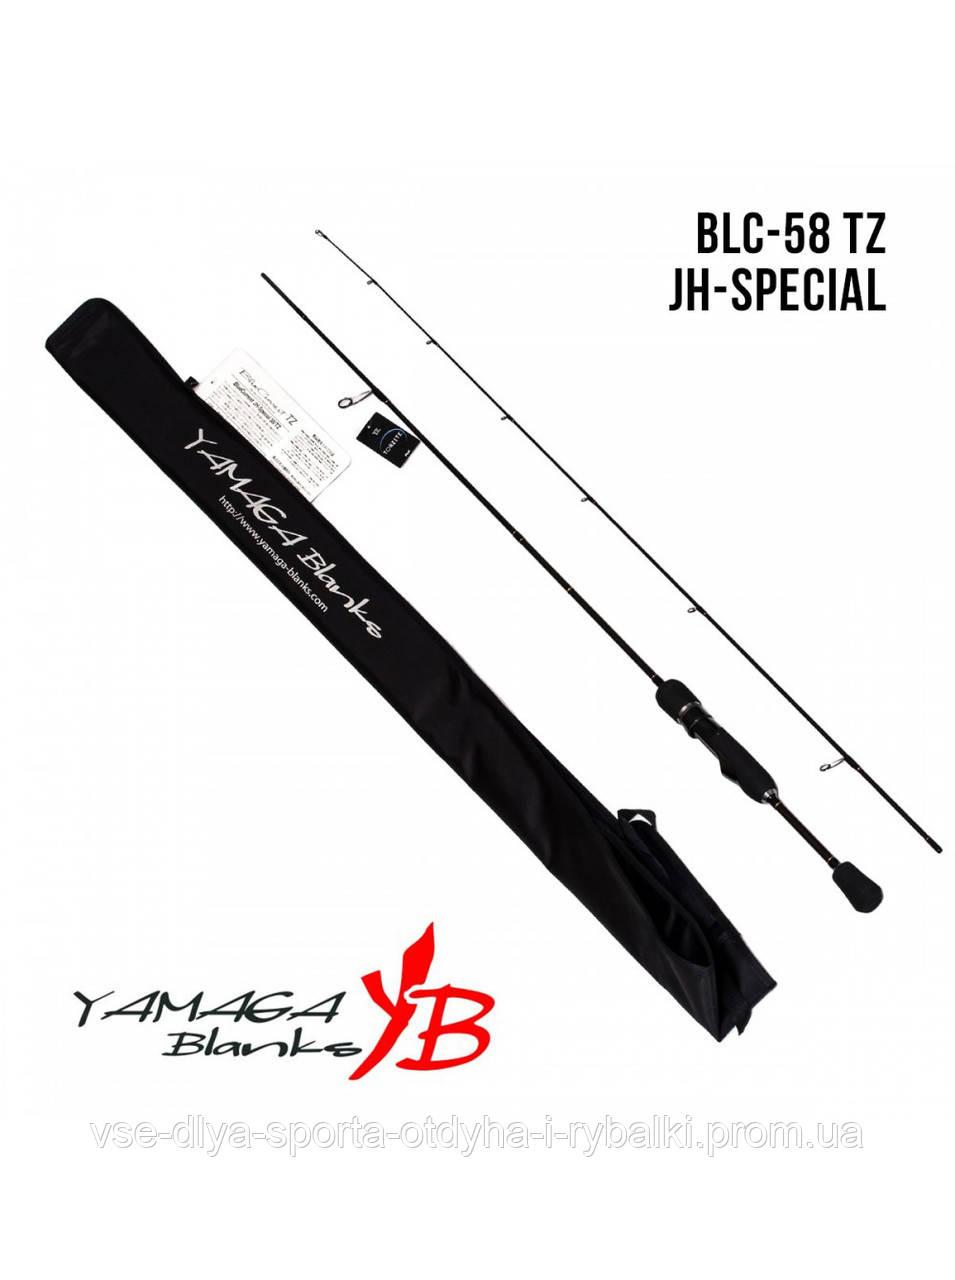 Удилище Yamaga Blanks Blue Current TZ BLC-58/Tz JH-Special